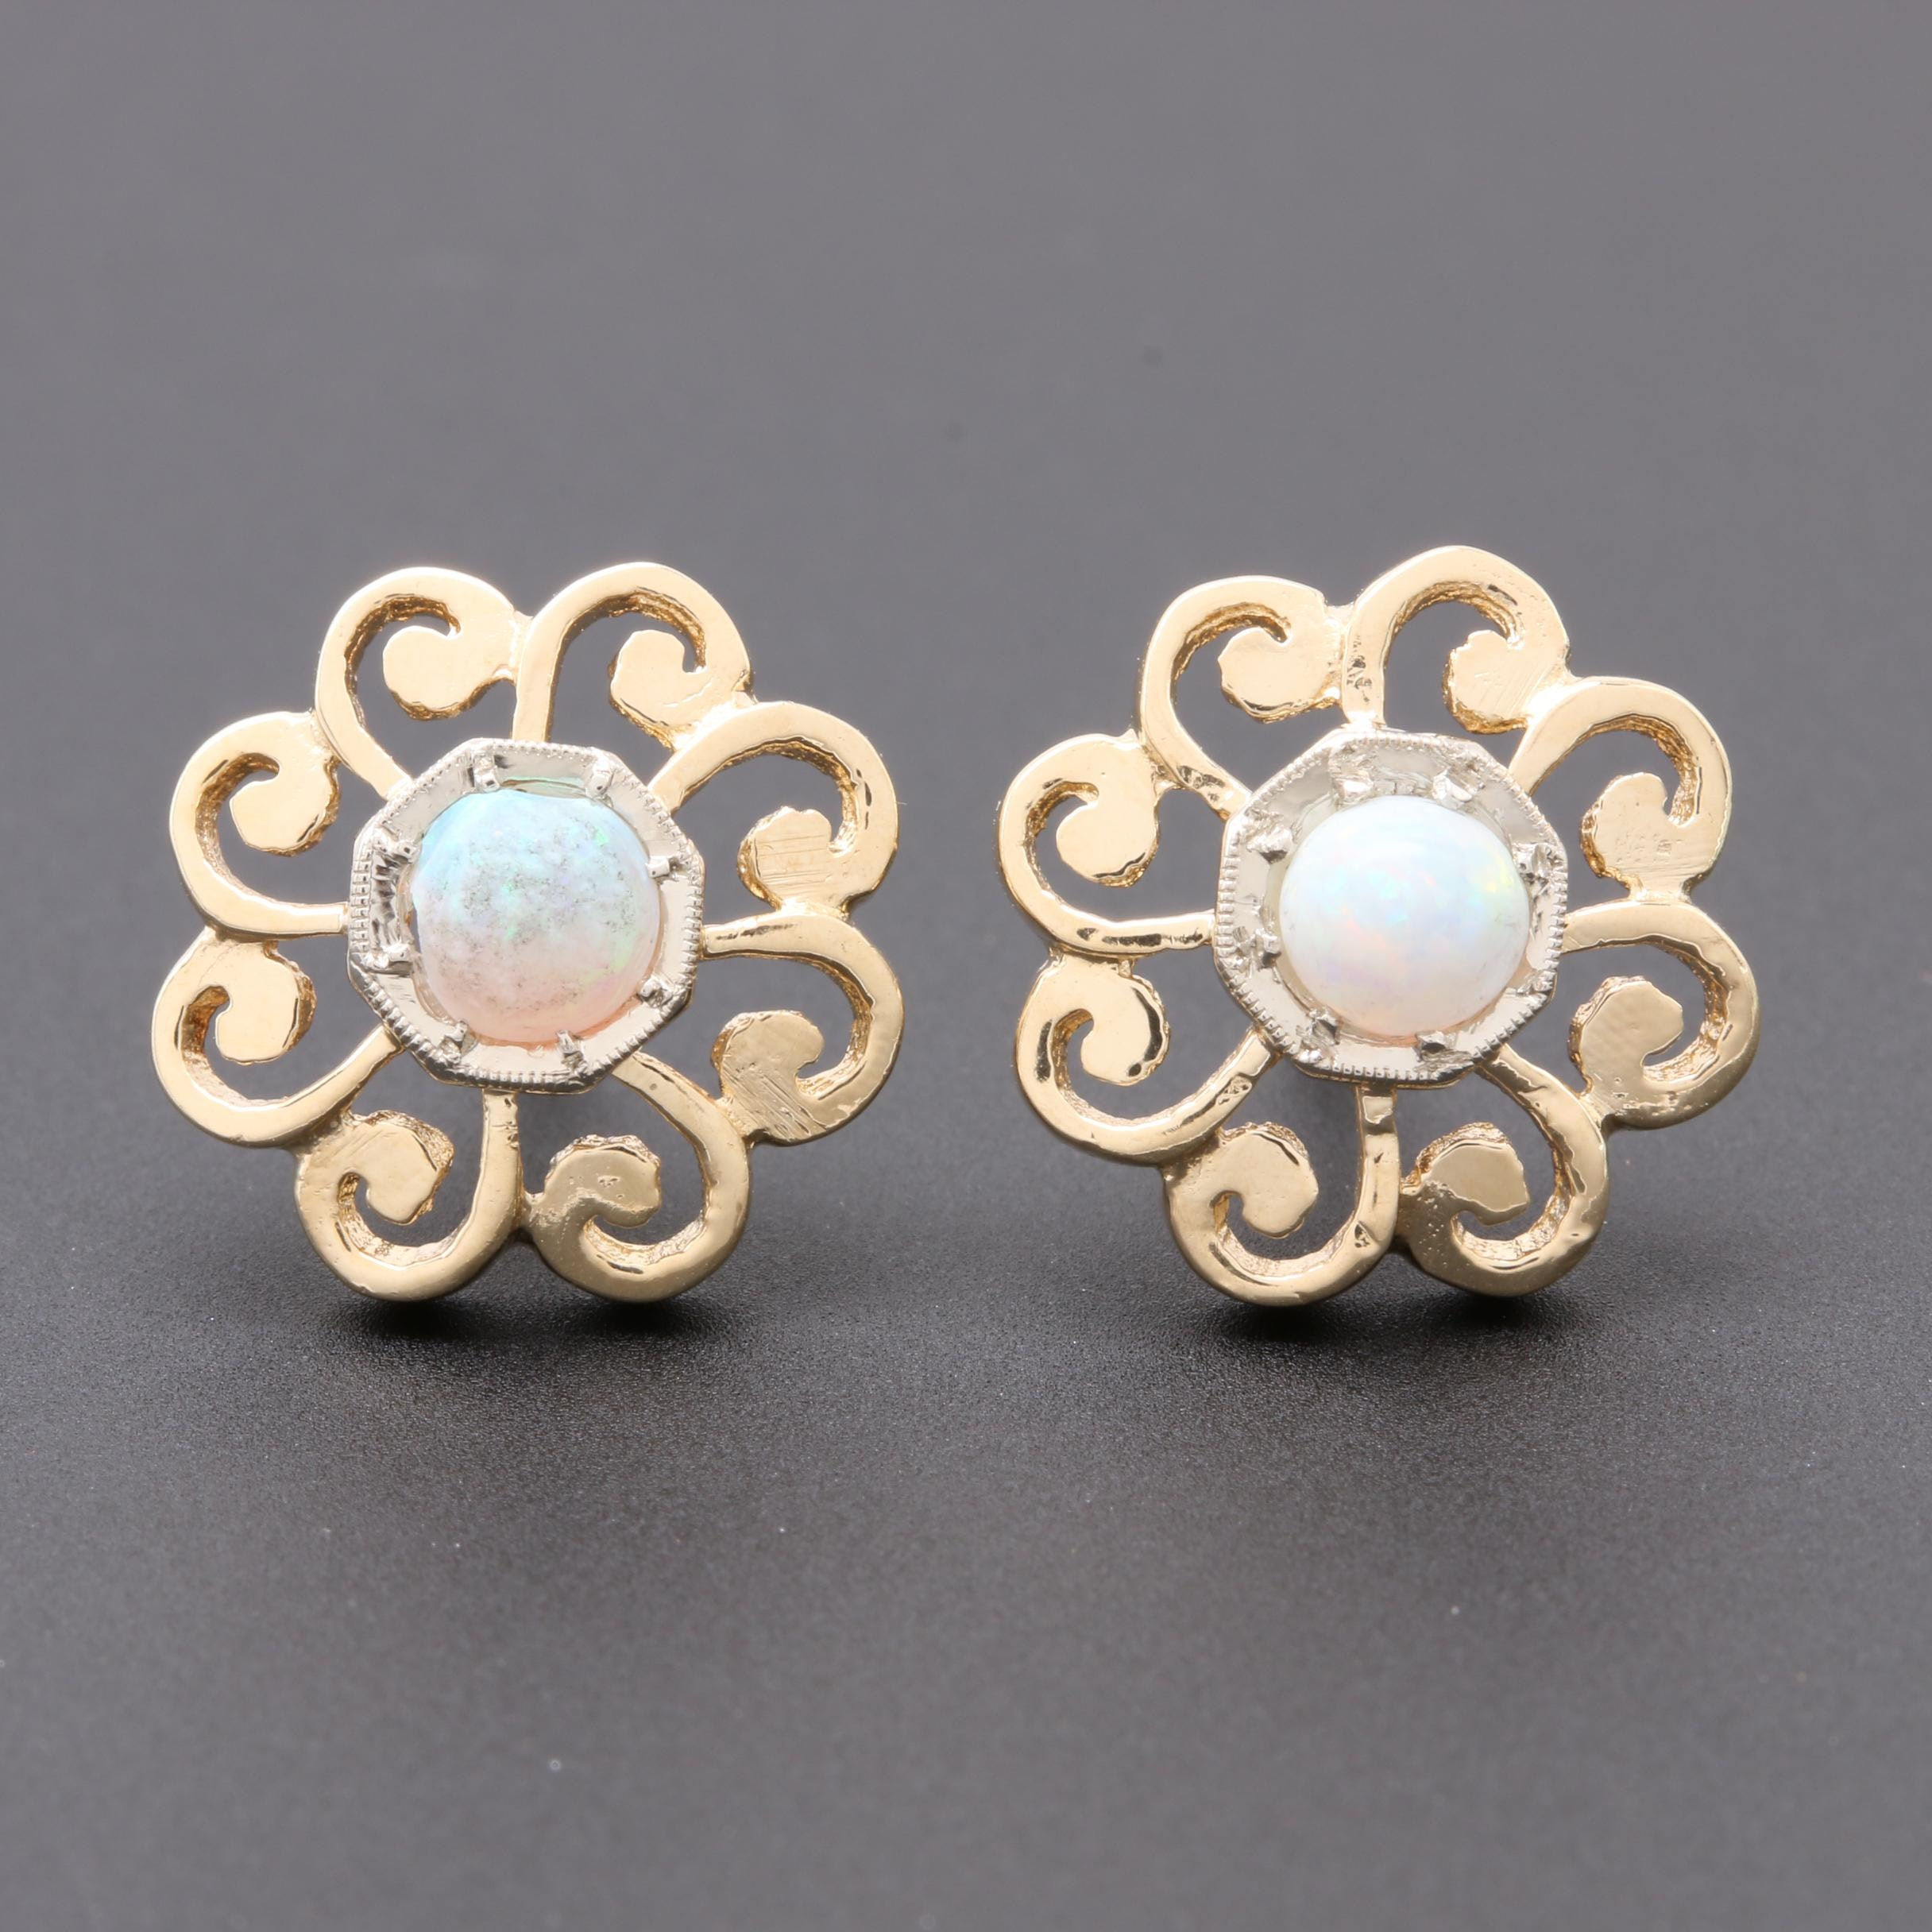 14K Yellow Gold Opal Floral Openwork Earrings